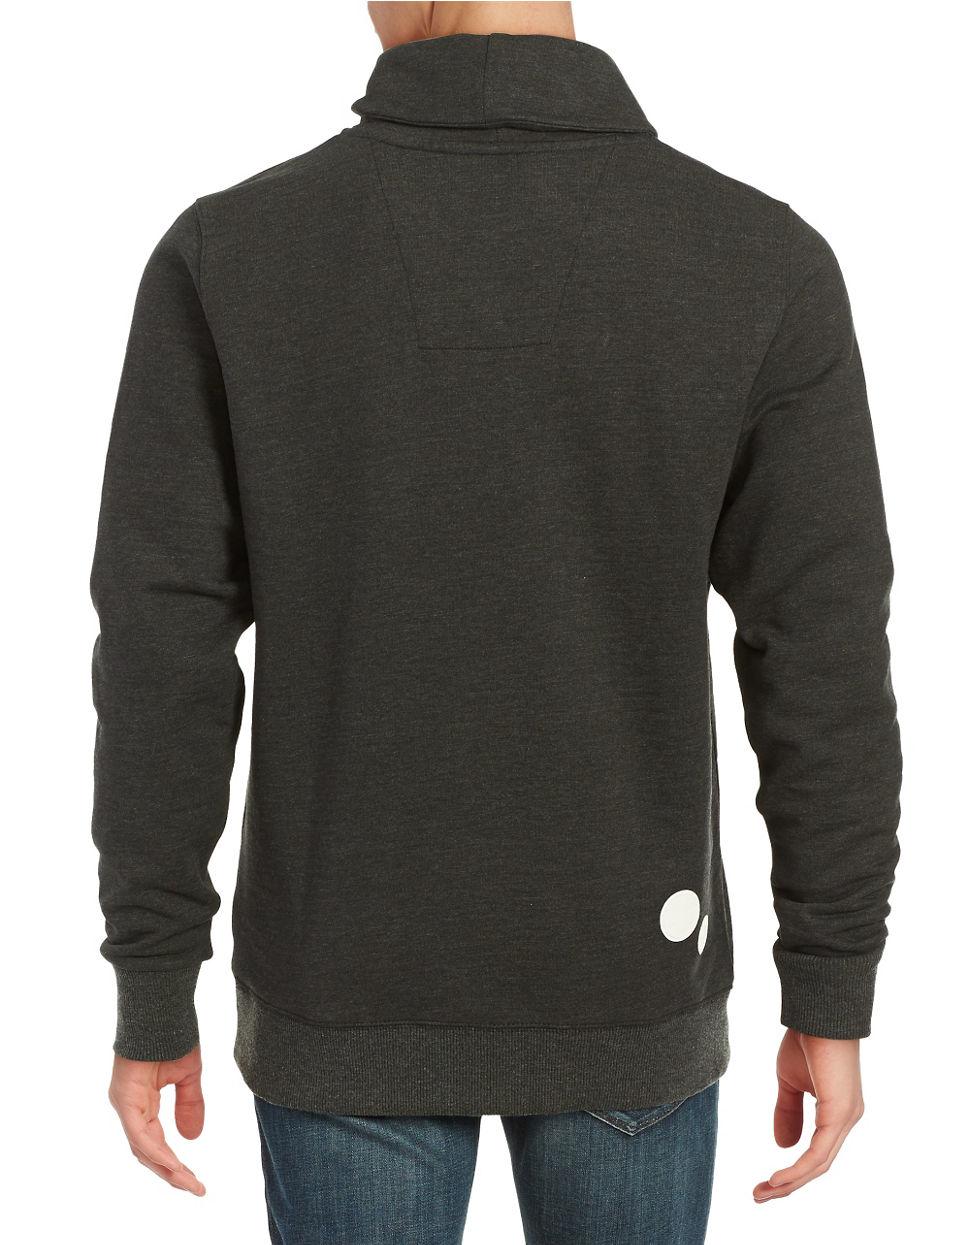 g star raw asymmetrical zip pullover in black for men lyst. Black Bedroom Furniture Sets. Home Design Ideas